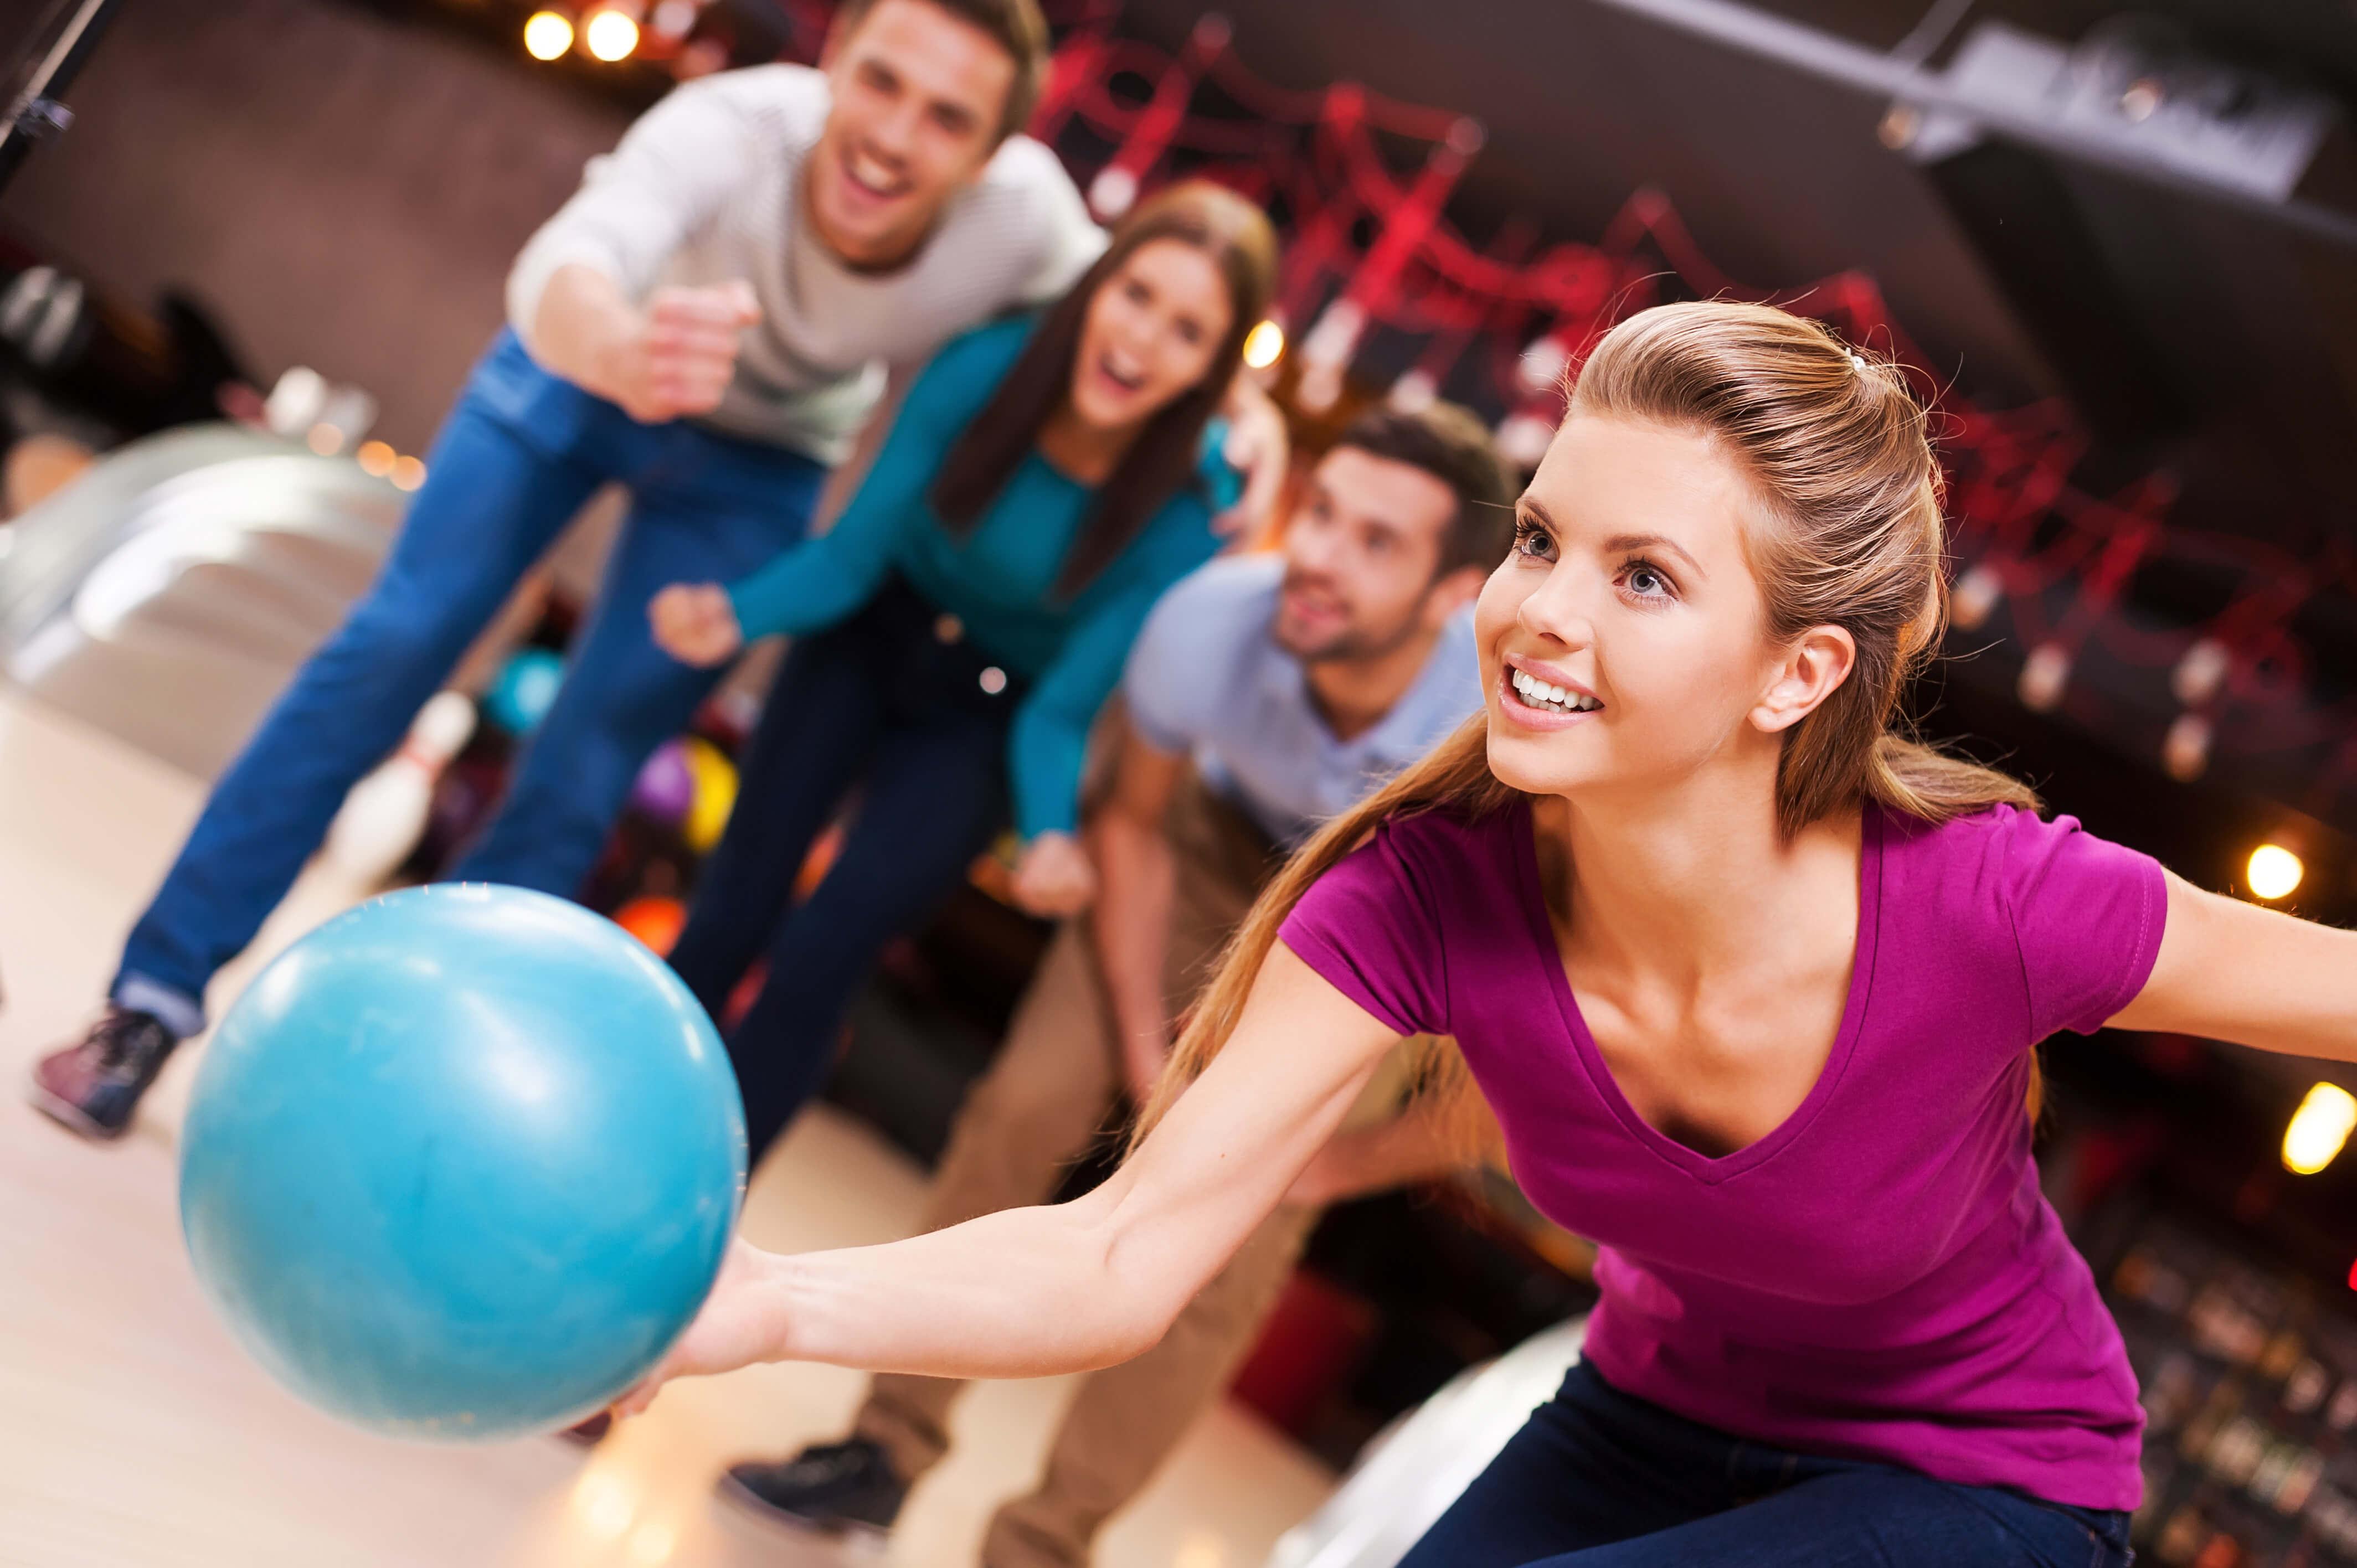 Bowling Outing & Team Building Event in Park City Utah | Park City Utah Resort & Spa | Westgate Resorts